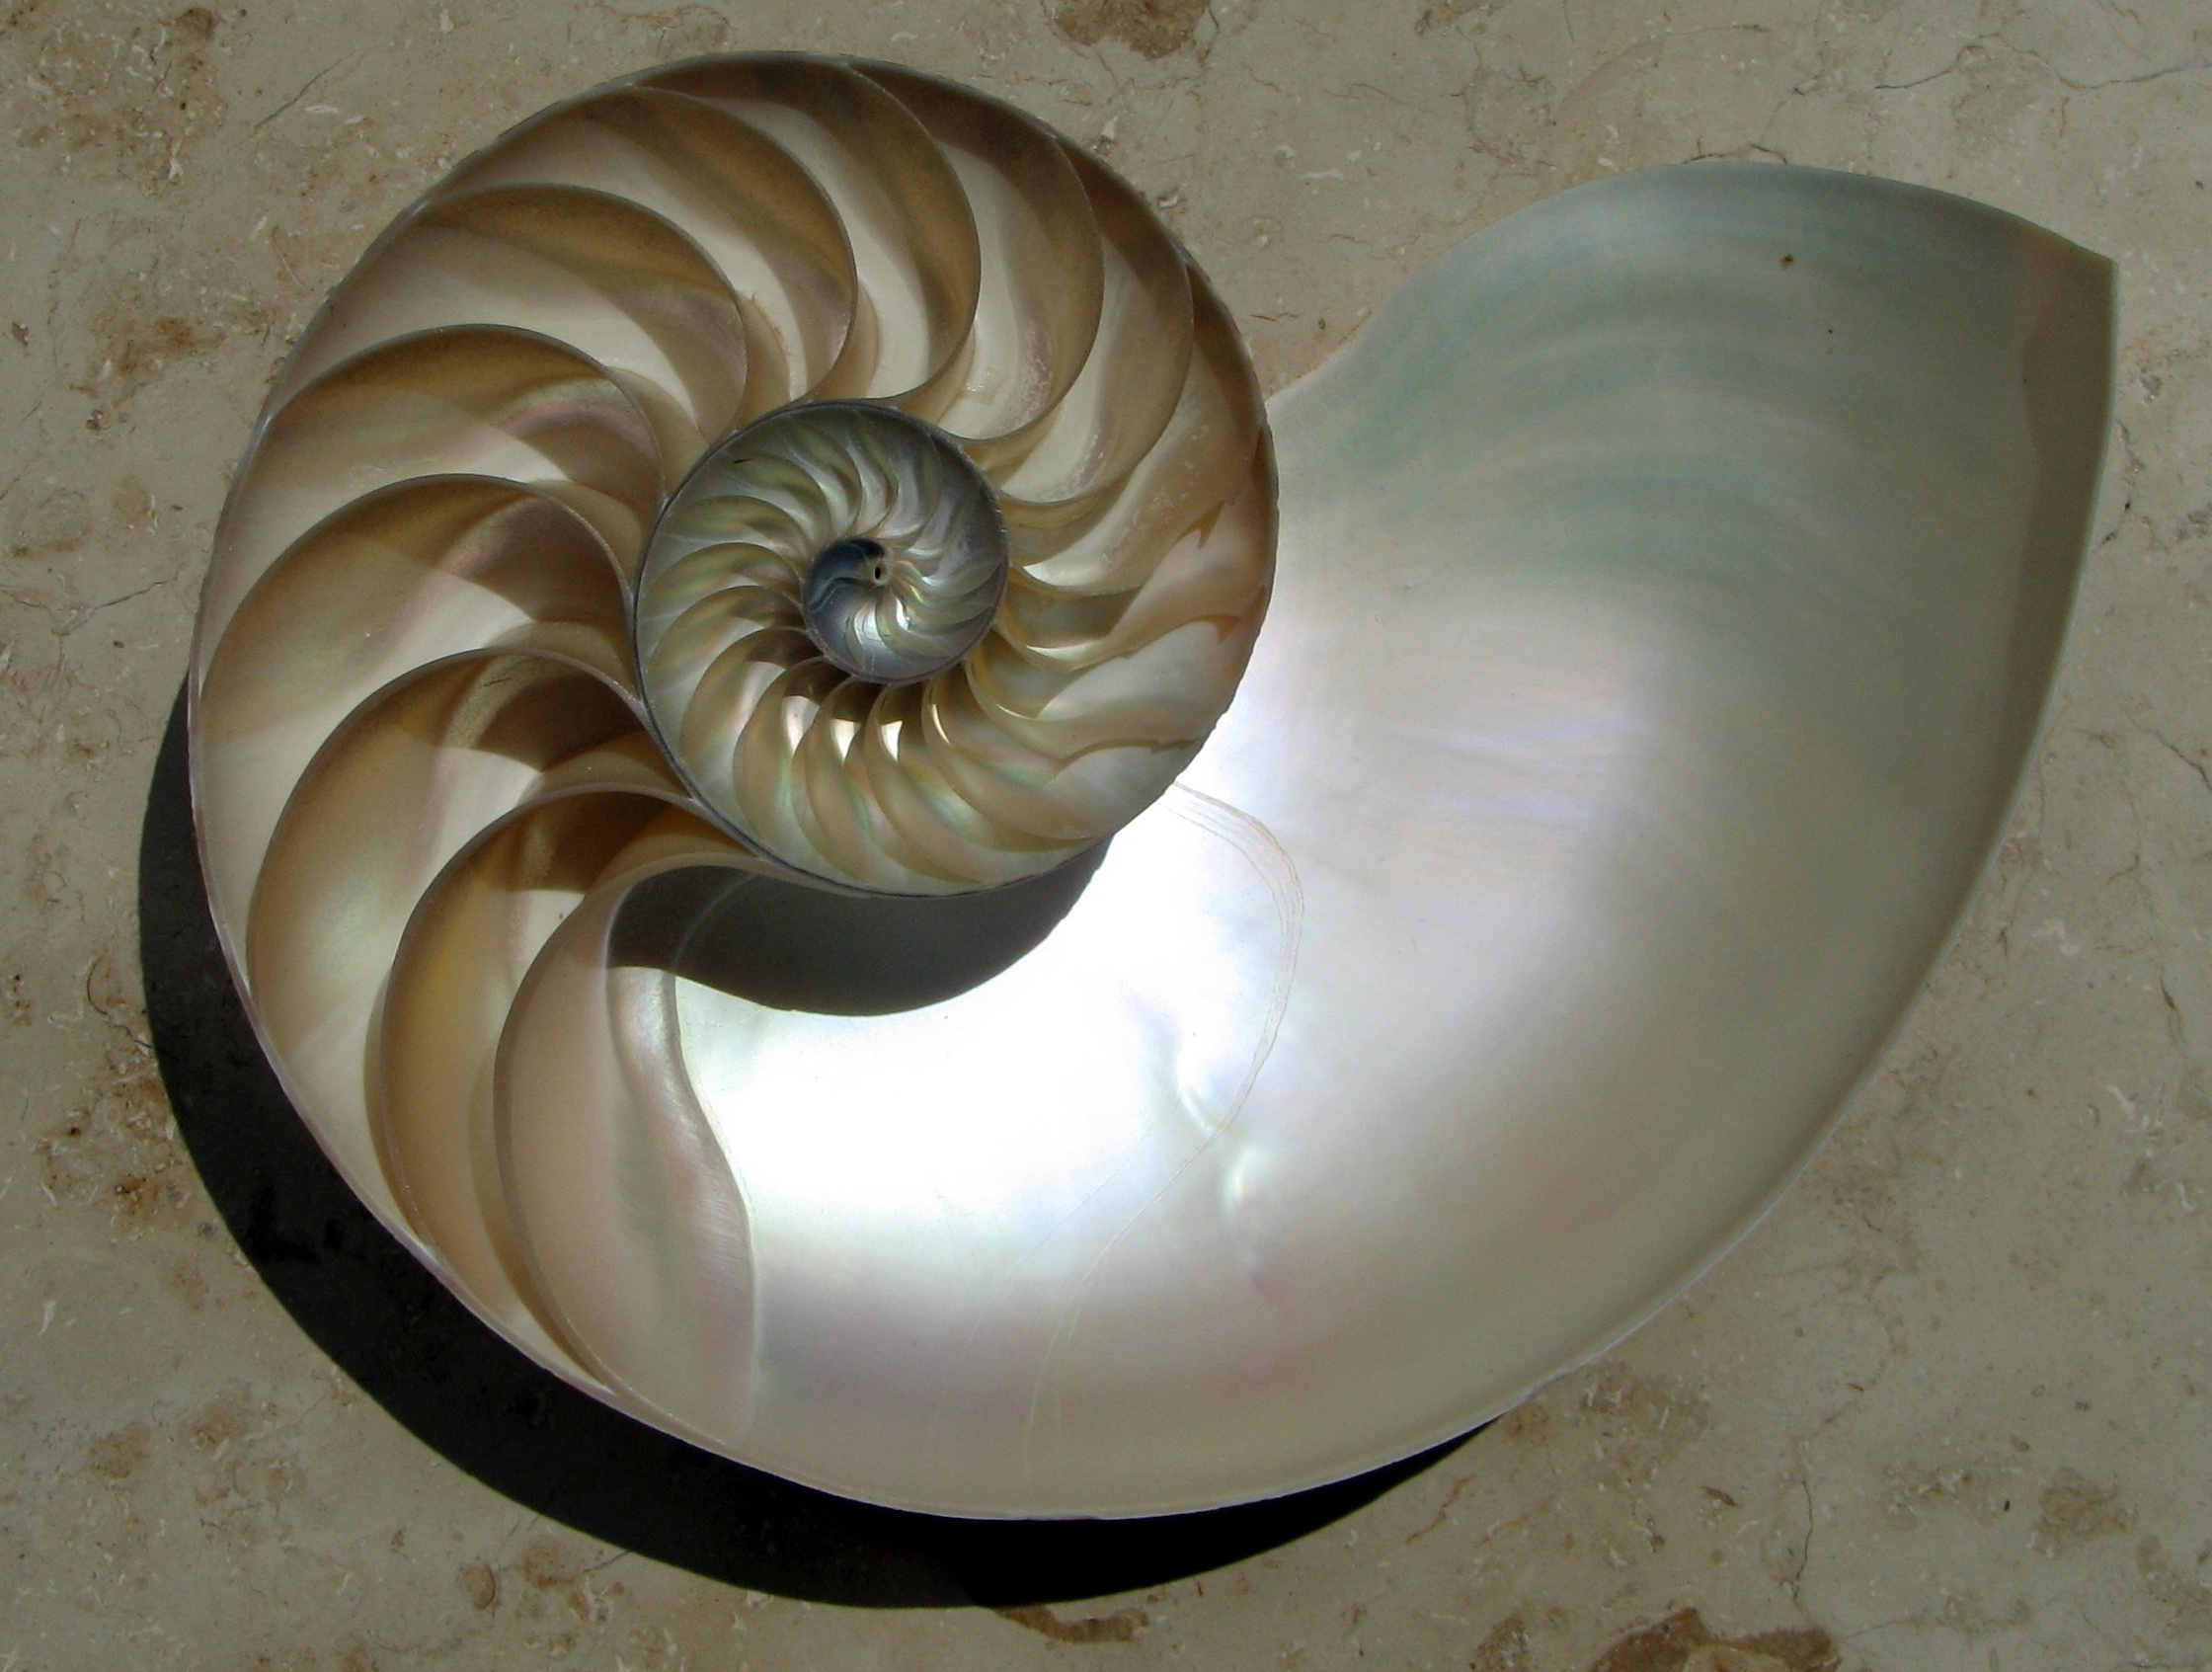 2012-10-18-NautilusCutawayLogarithmicSpiral.jpg